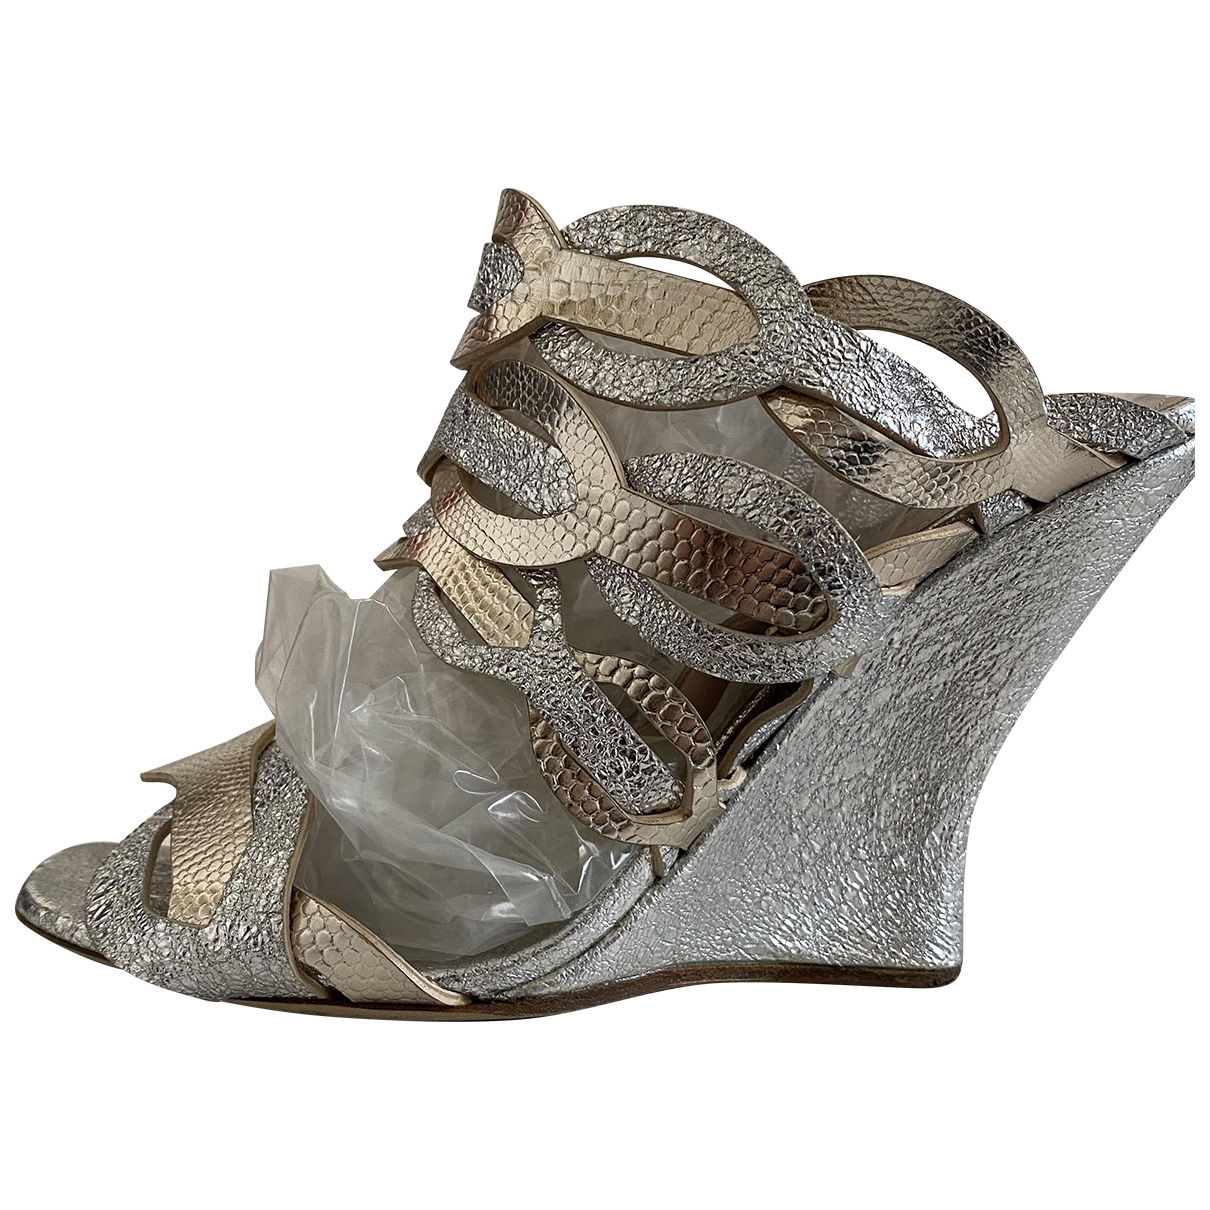 Dries Van Noten \N Silver Leather Sandals for Women 38 EU